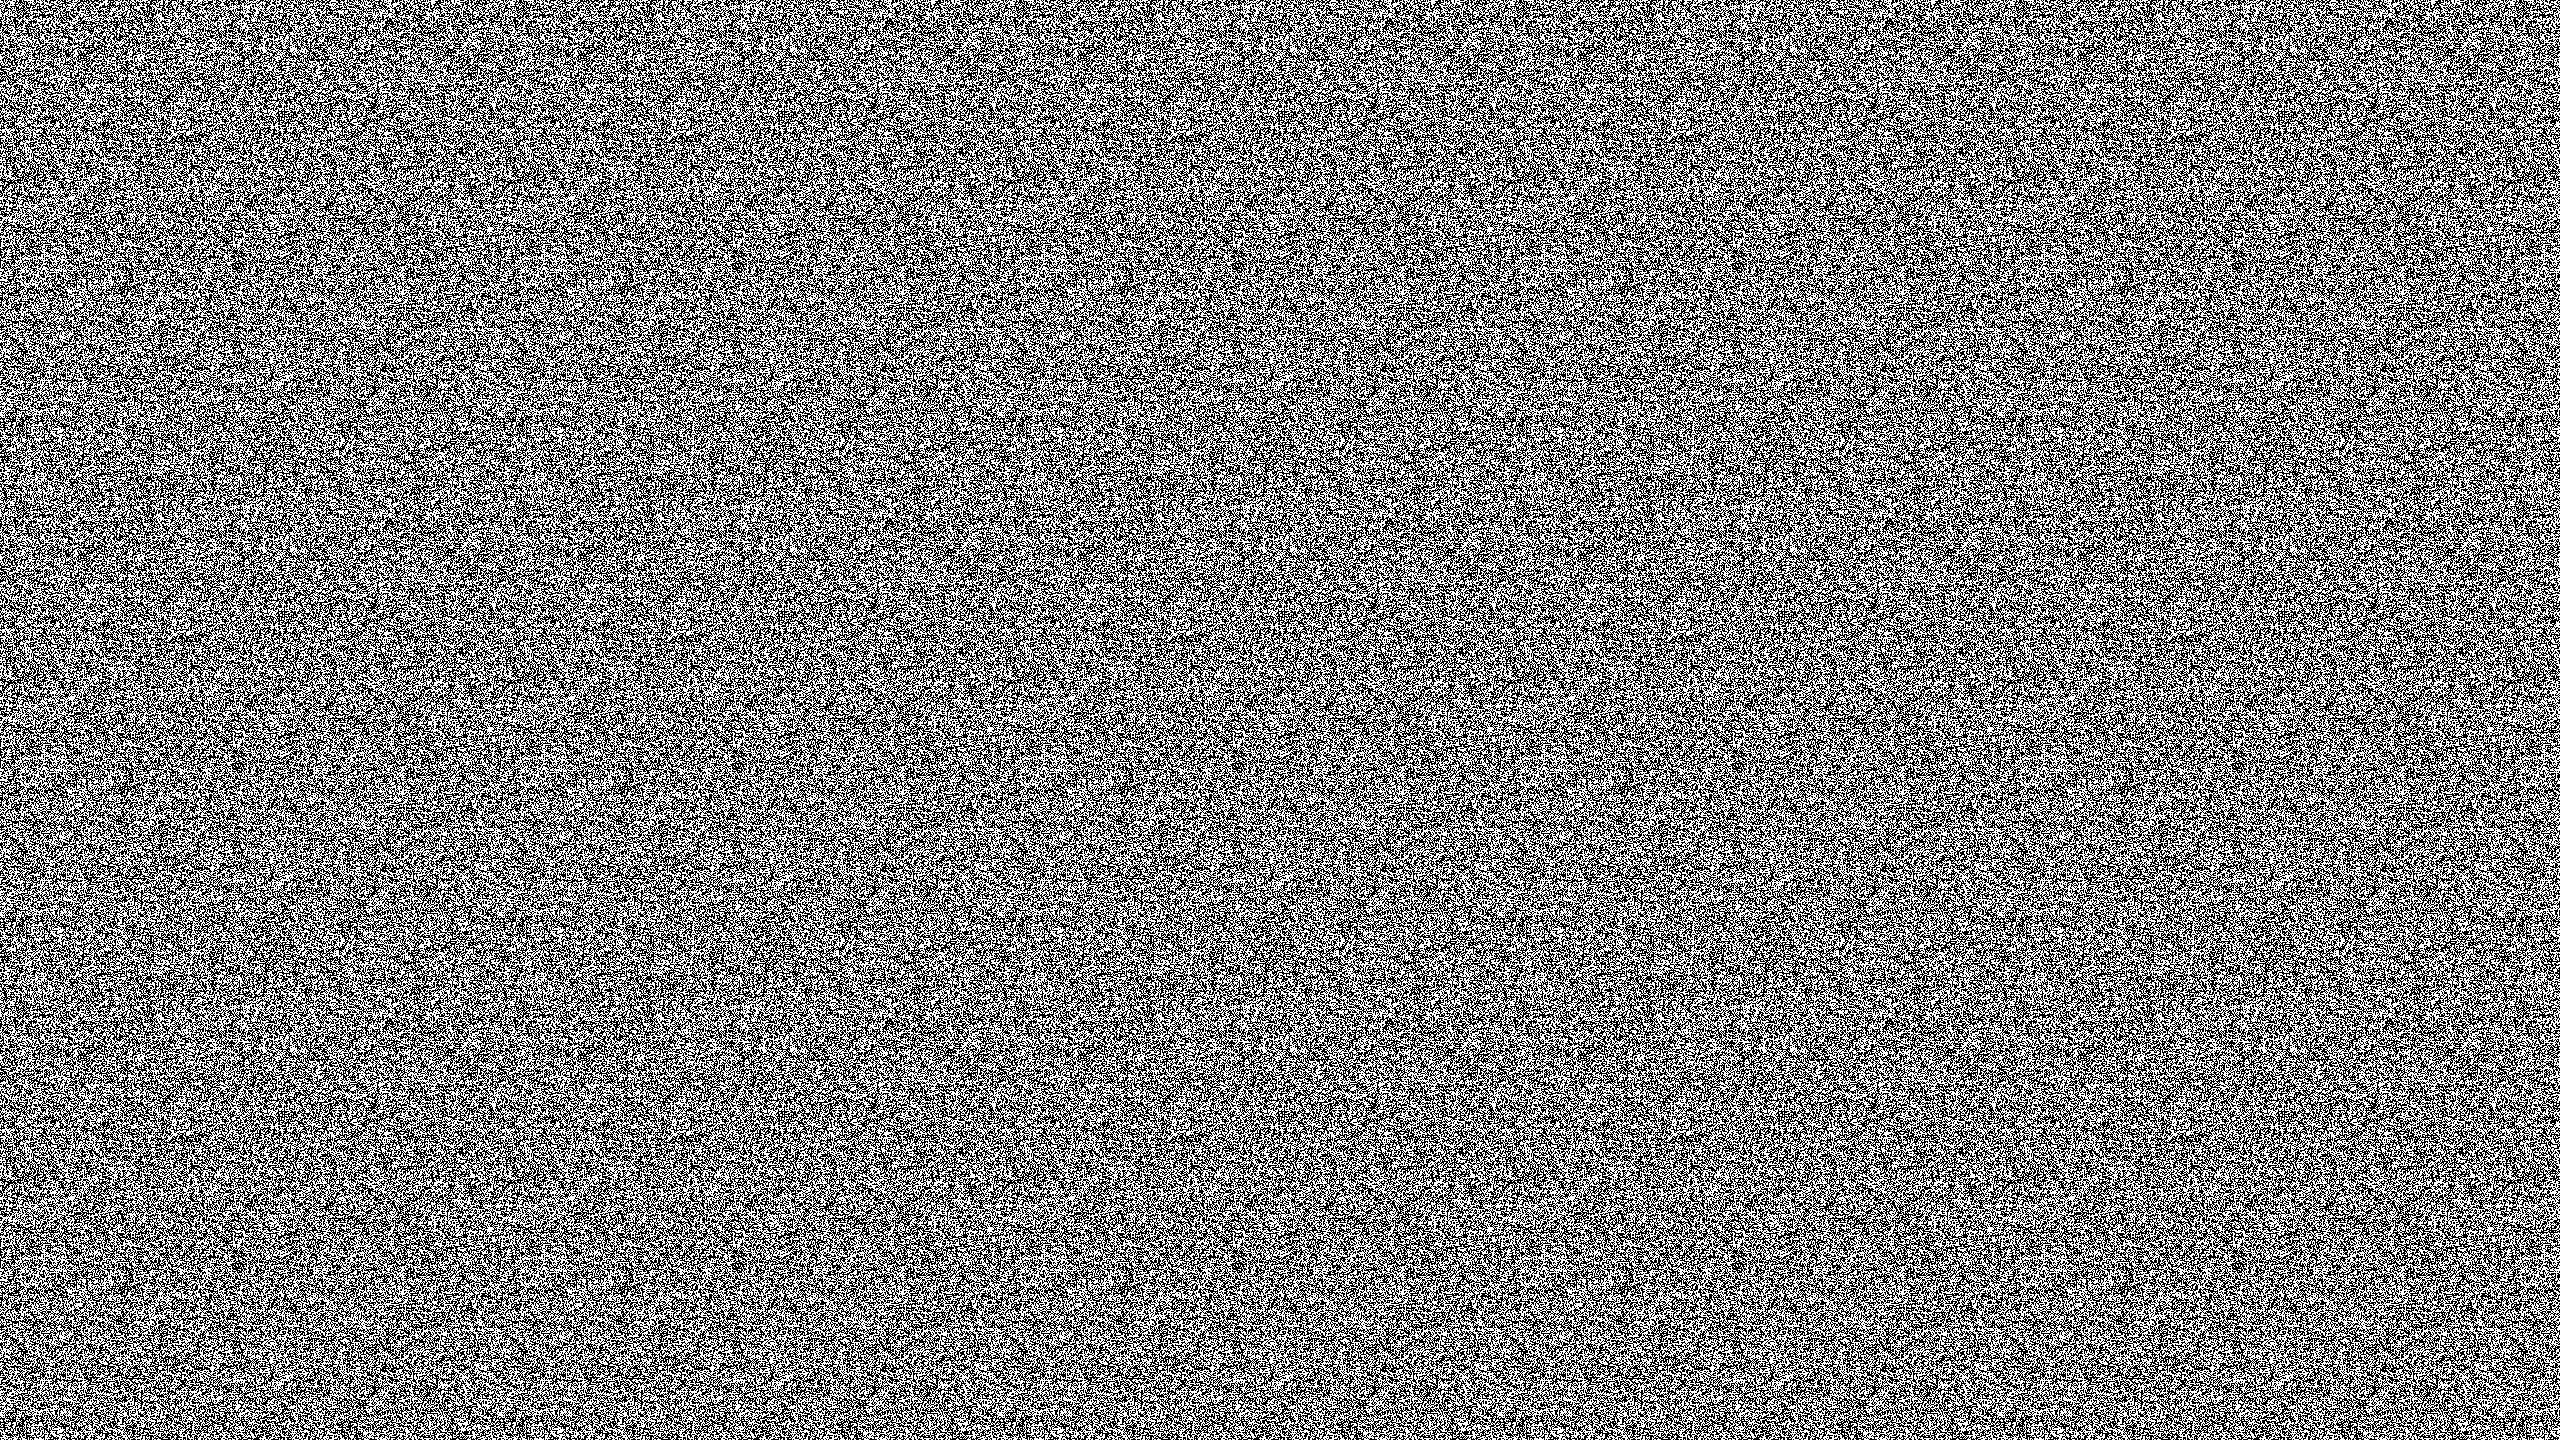 static wallpaper - photo #12